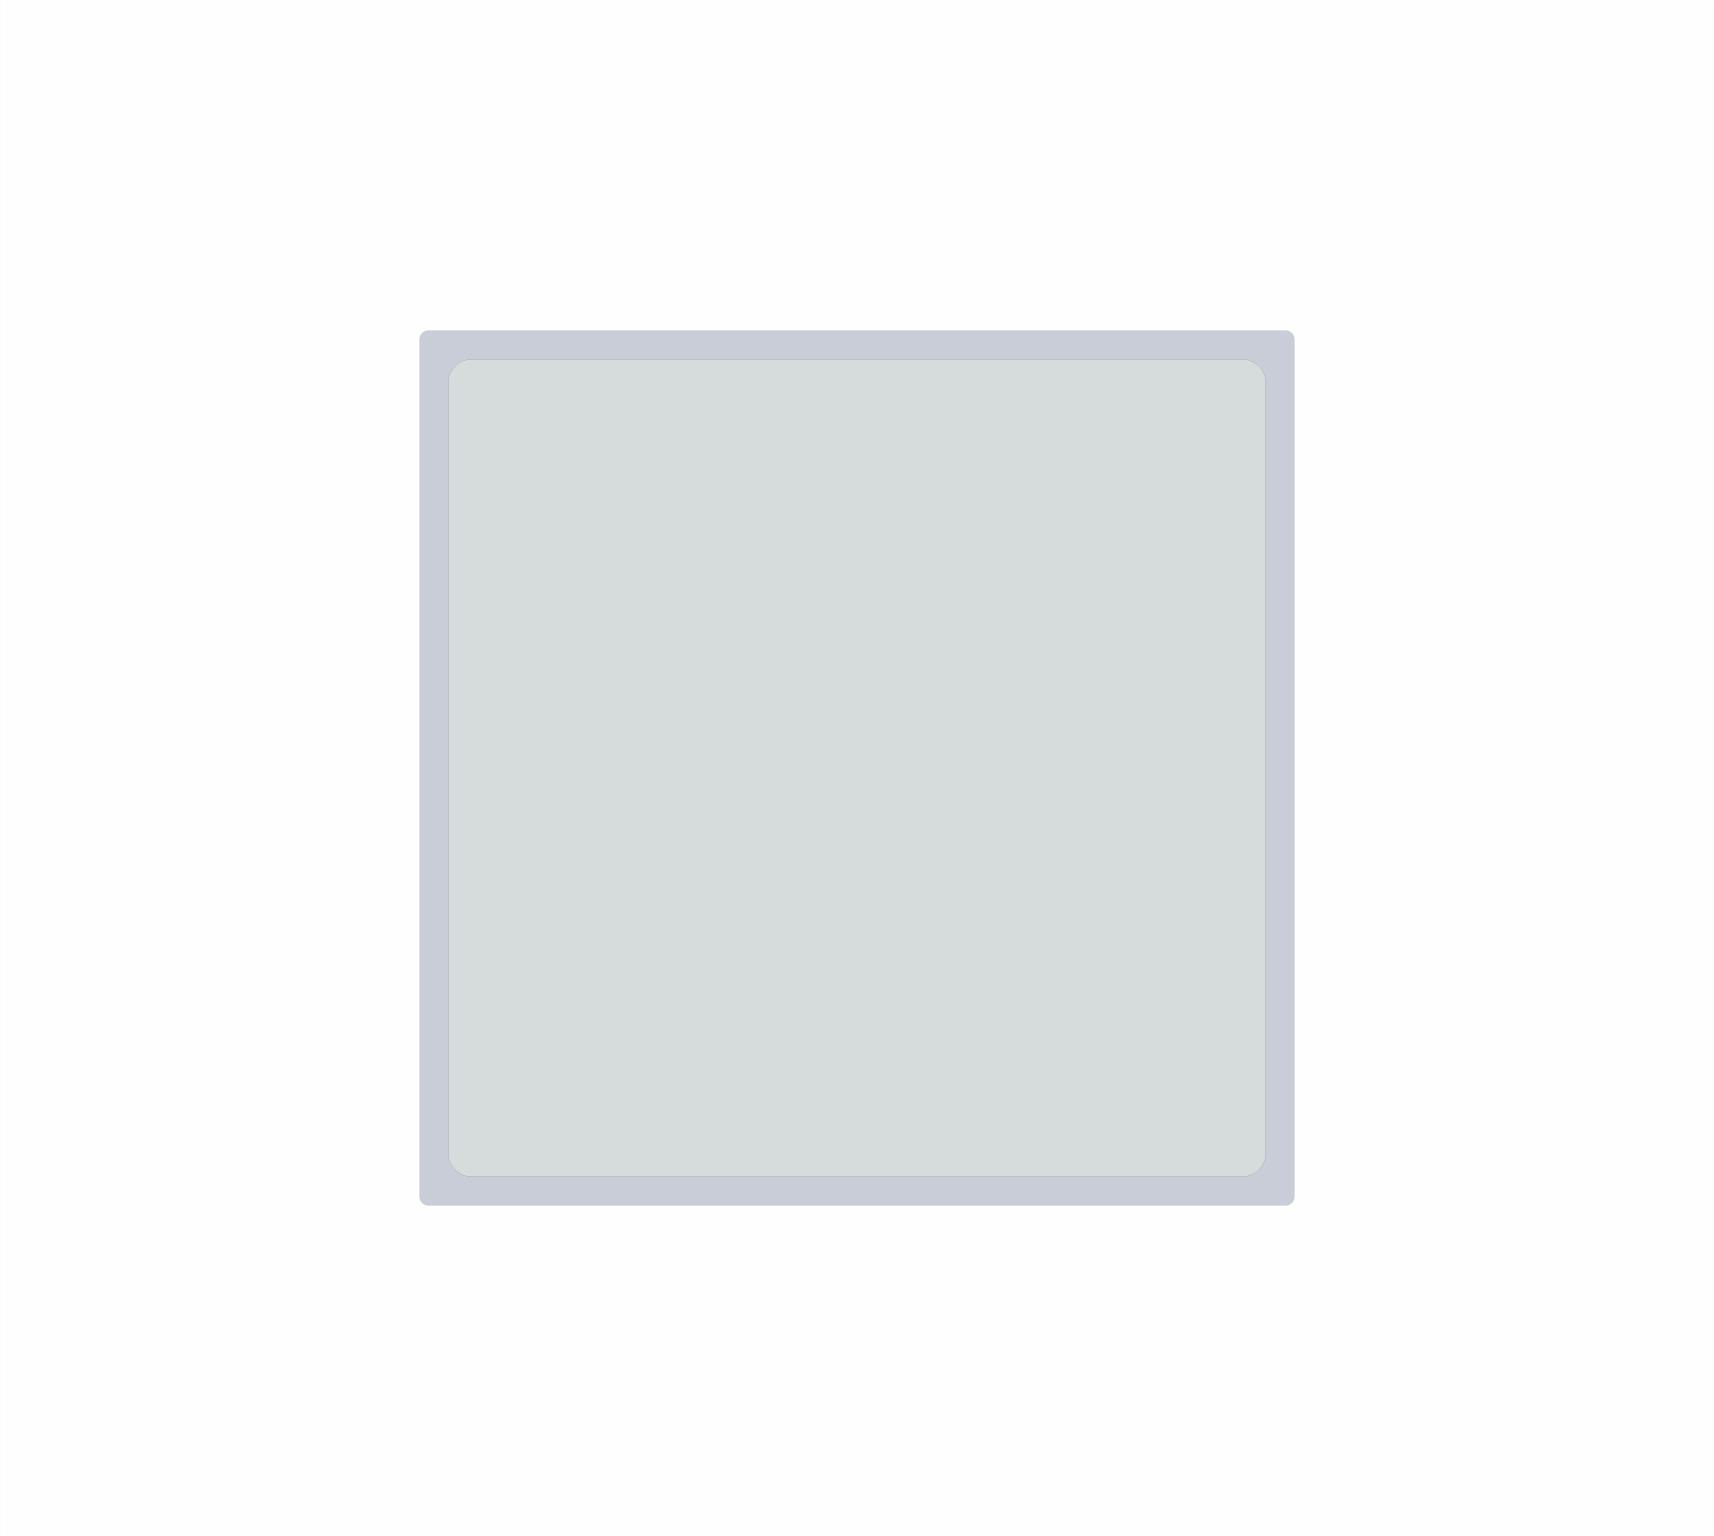 PAINEL-BACKLIGHT-LED-P-620E-40-40-3BRC